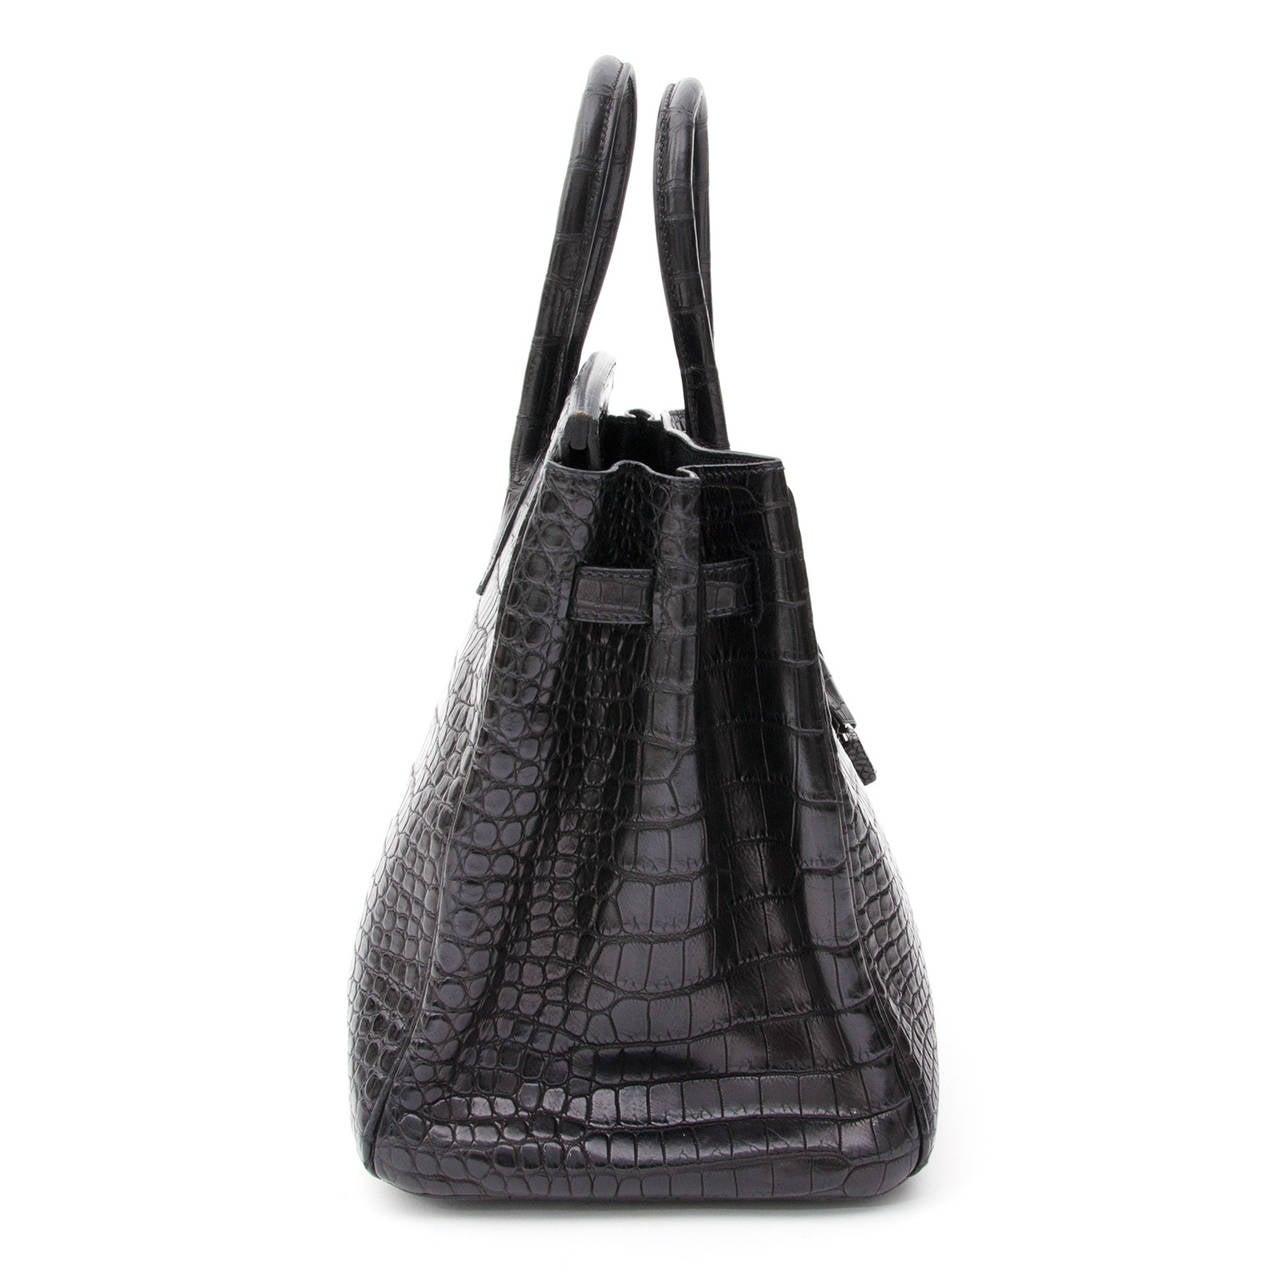 Hermes Matte Black Porosus Crocodile Birkin 35 9